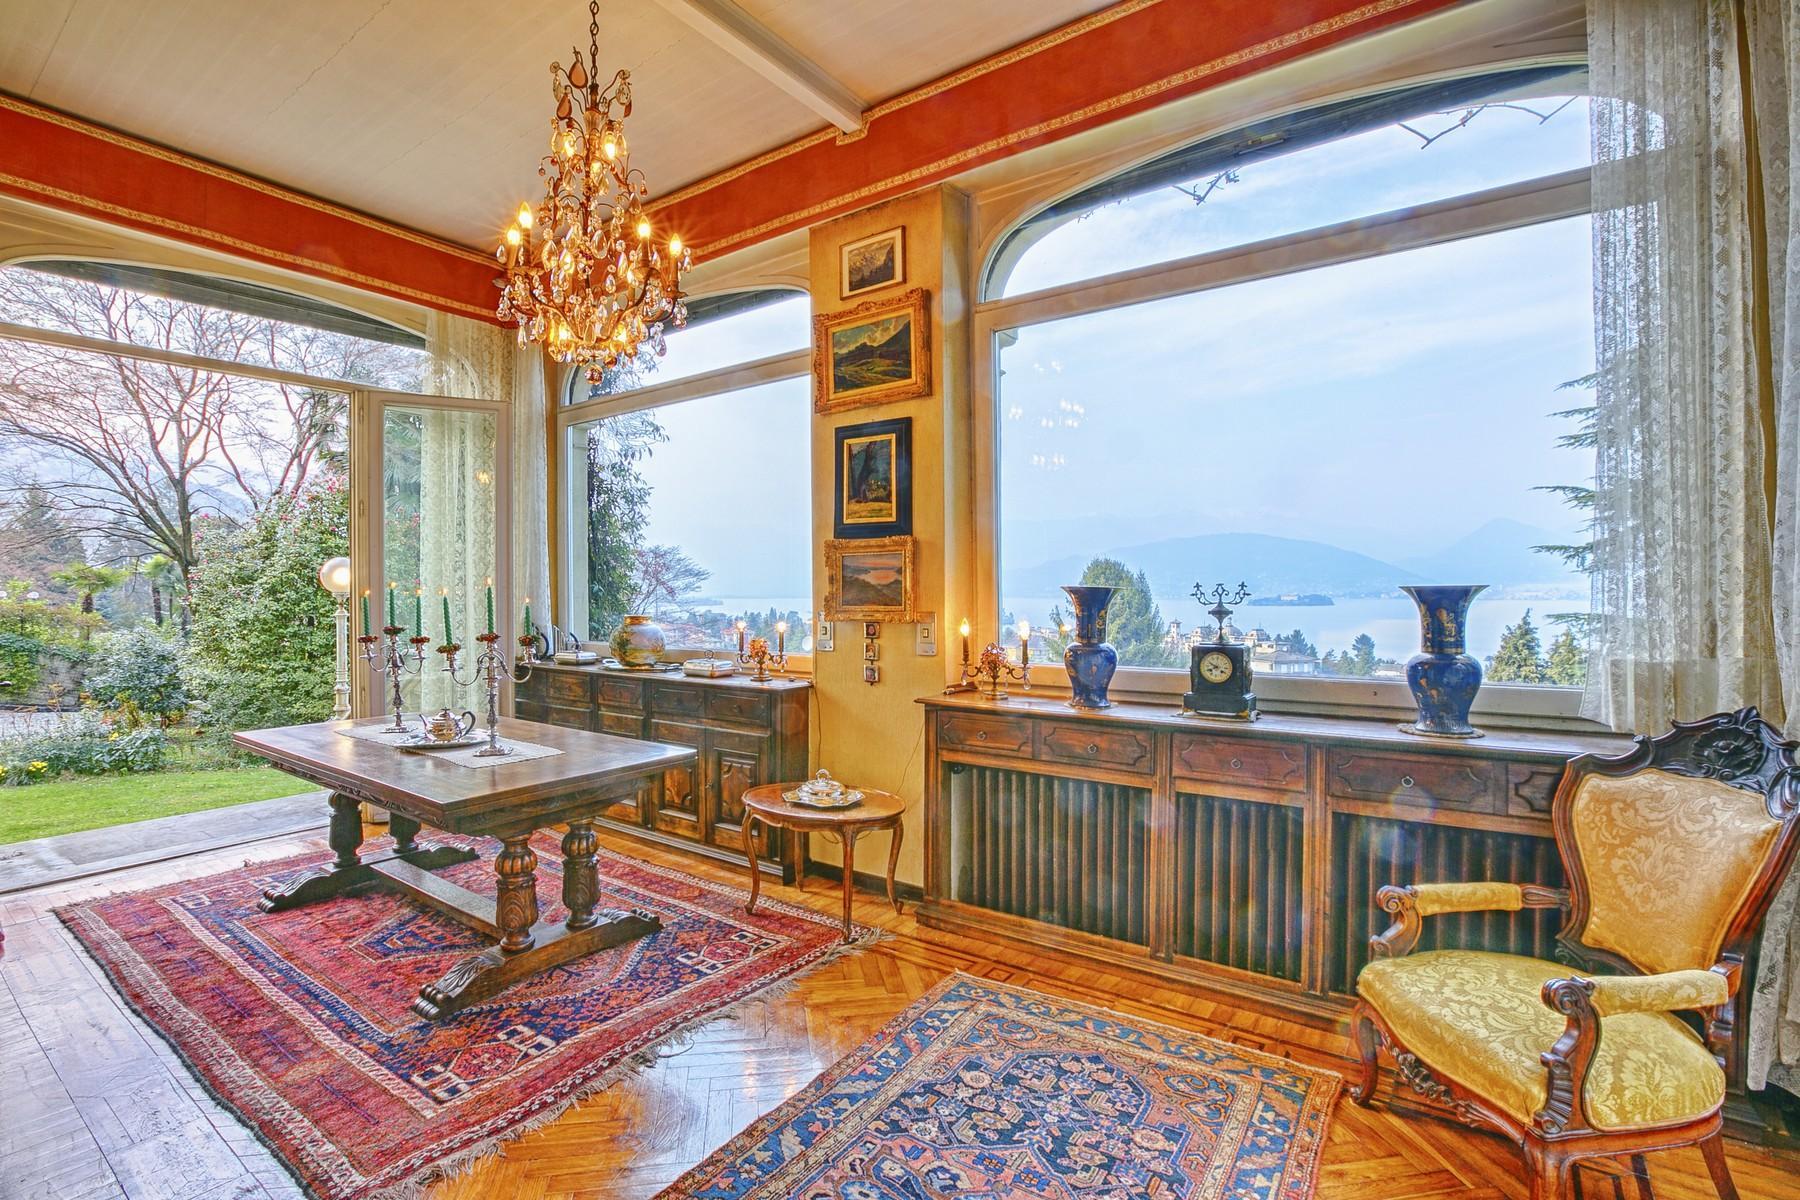 久负盛名的别墅享有Lago Maggiore湖景风光 - 4